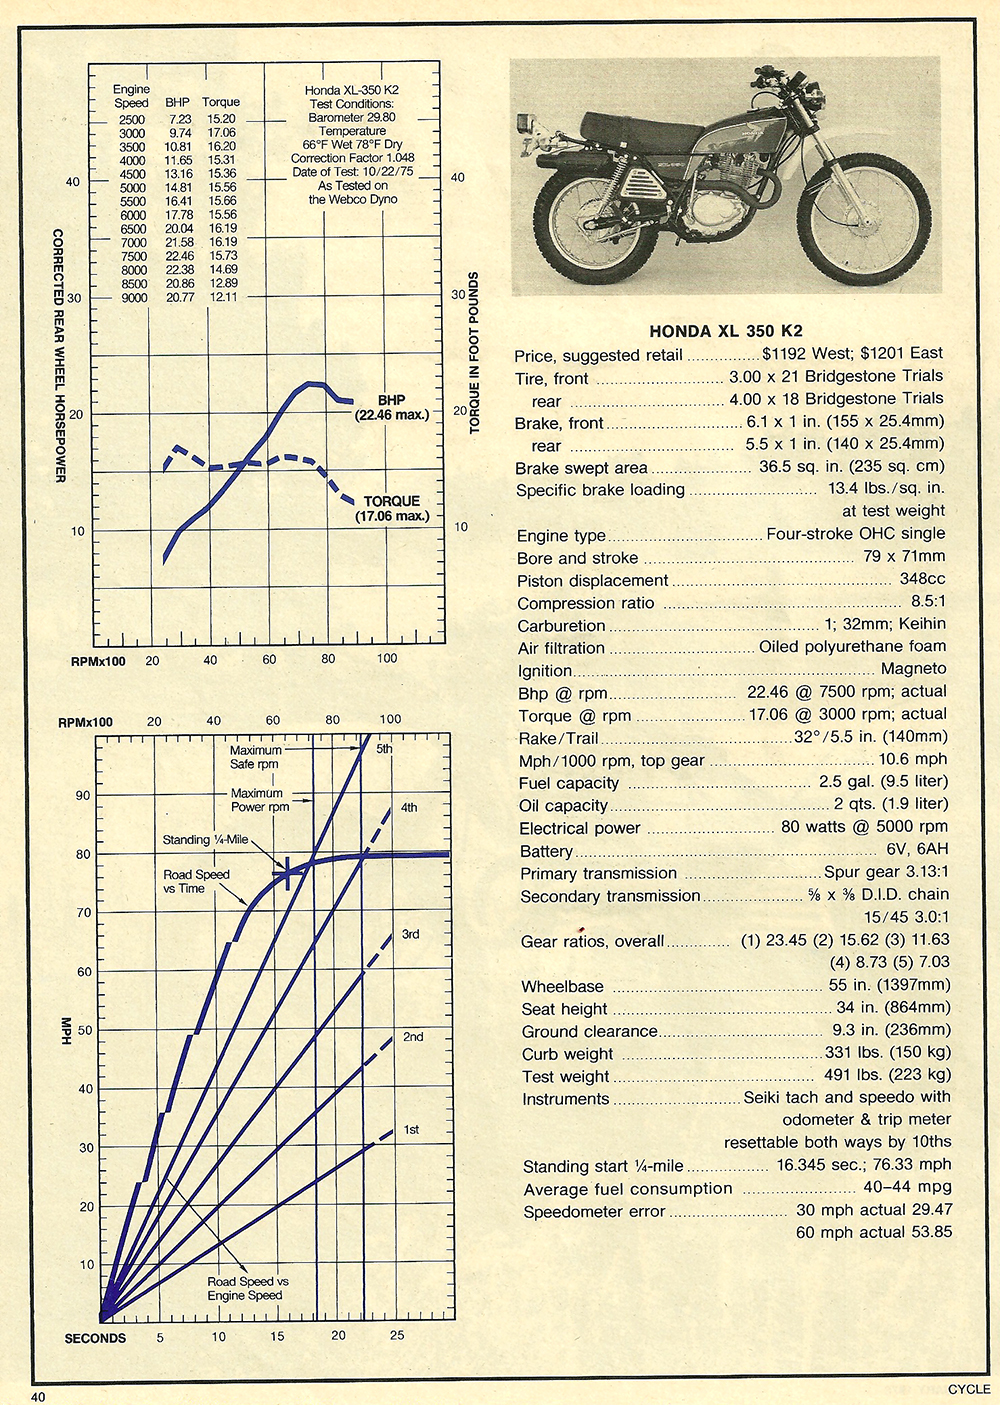 1976 Honda XL 350 K2 road test 3.jpg